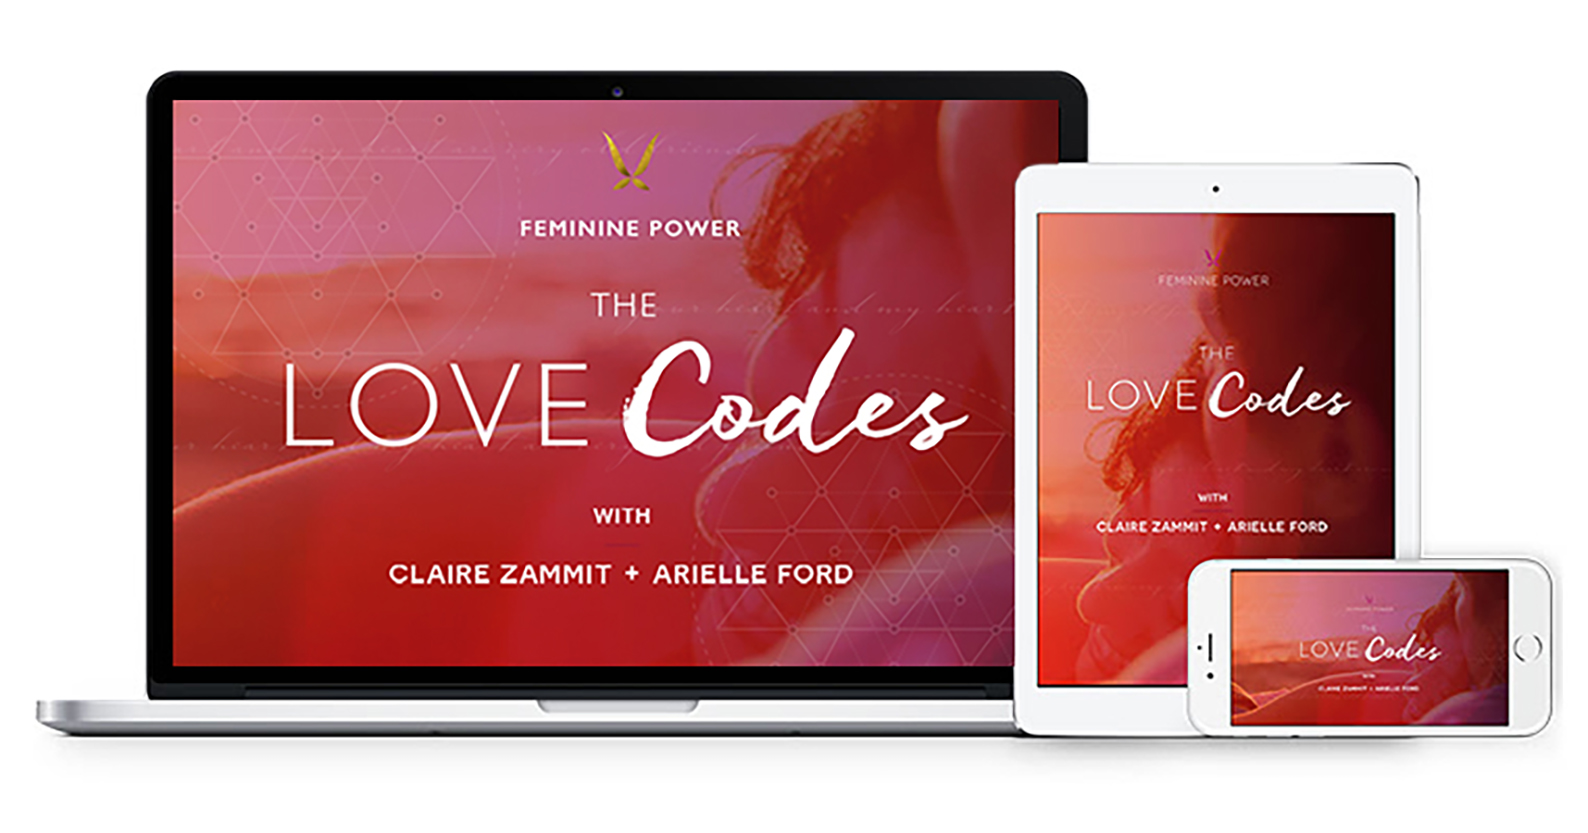 love-codes - Feminine Power